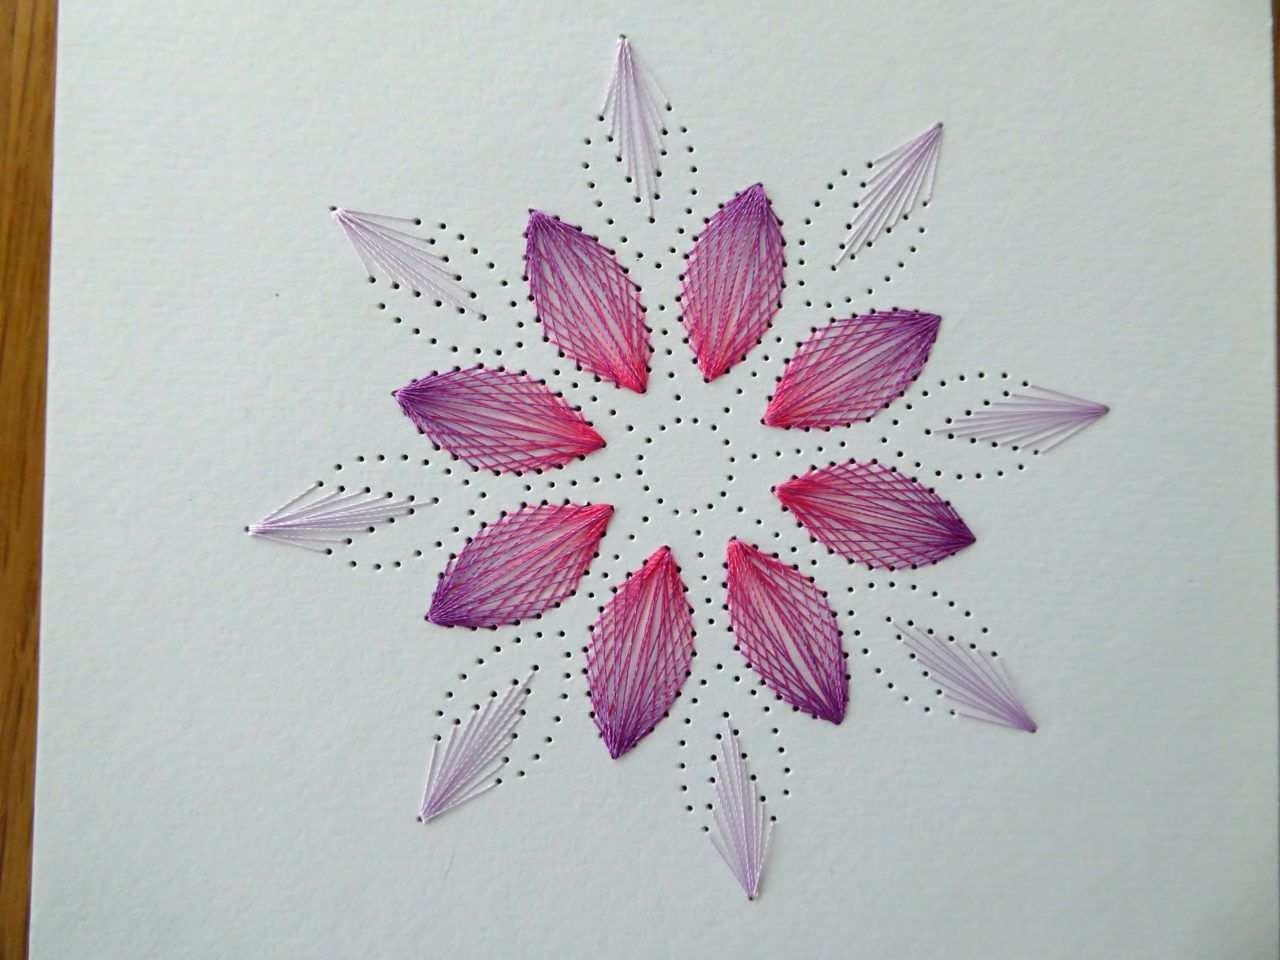 Blutenmandala Mit Fadengrafik Diy Family Papierstickerei Fadengrafik Sticken Auf Papier